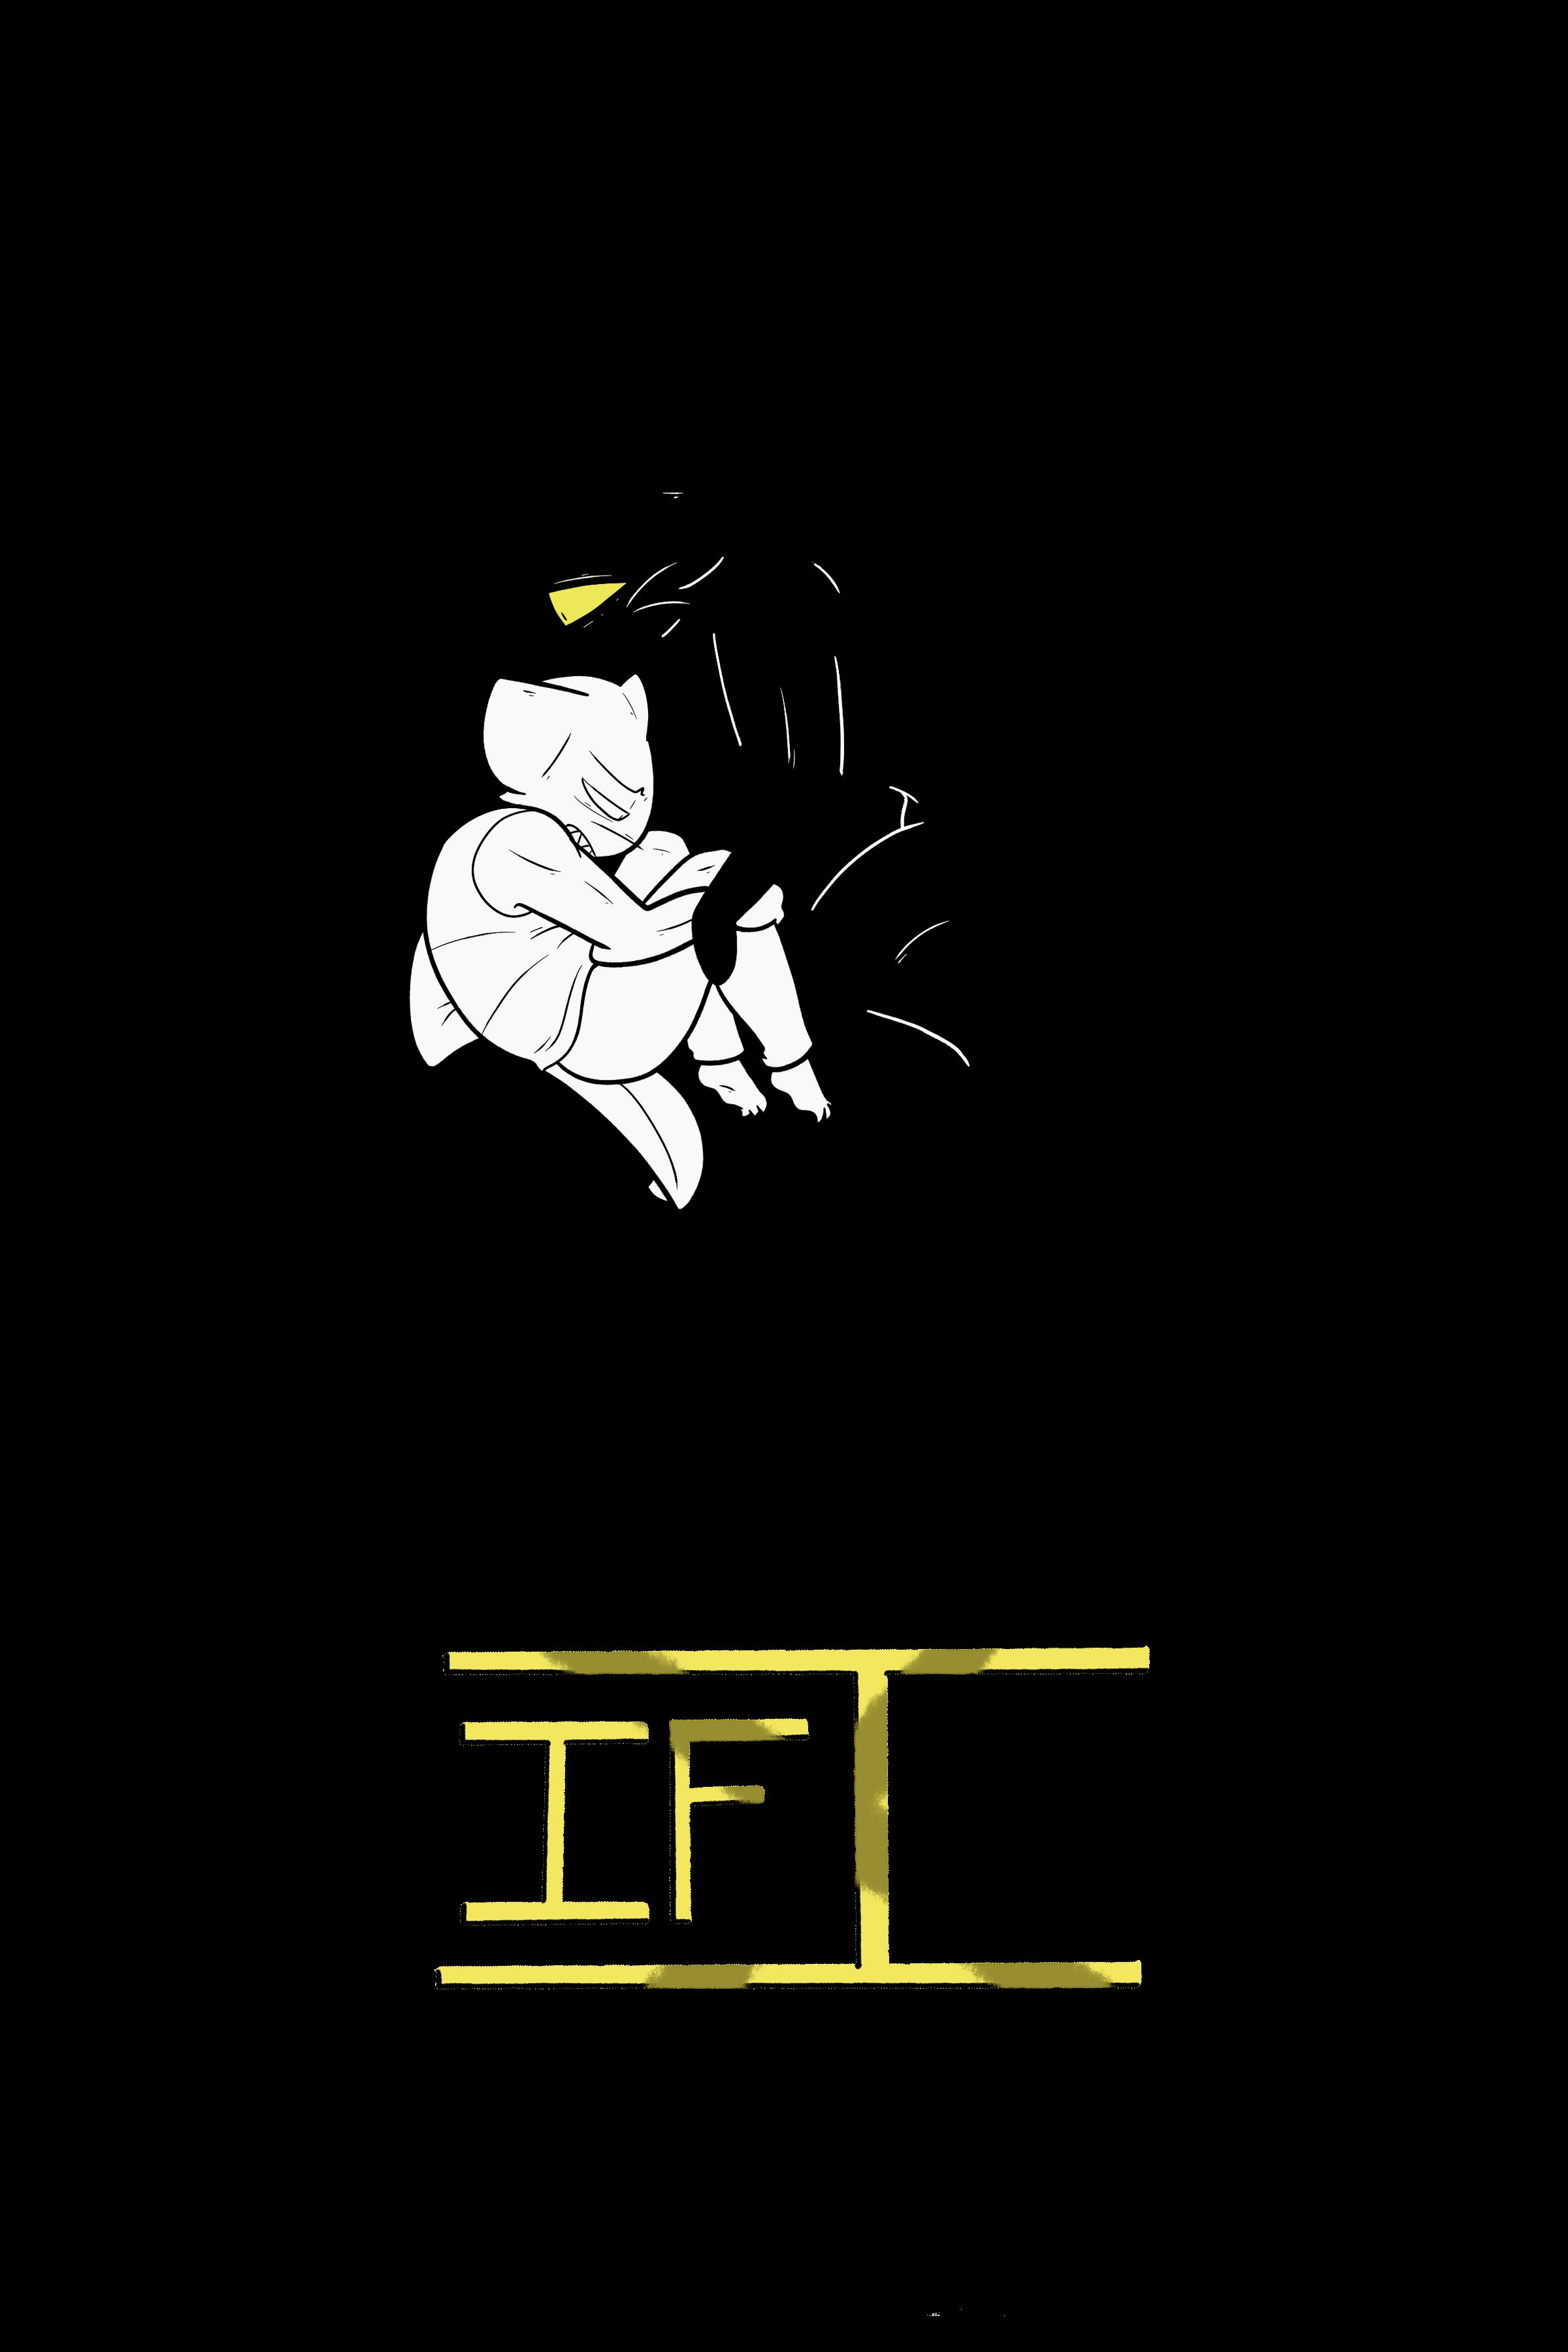 --IF I CHAPTER XI--